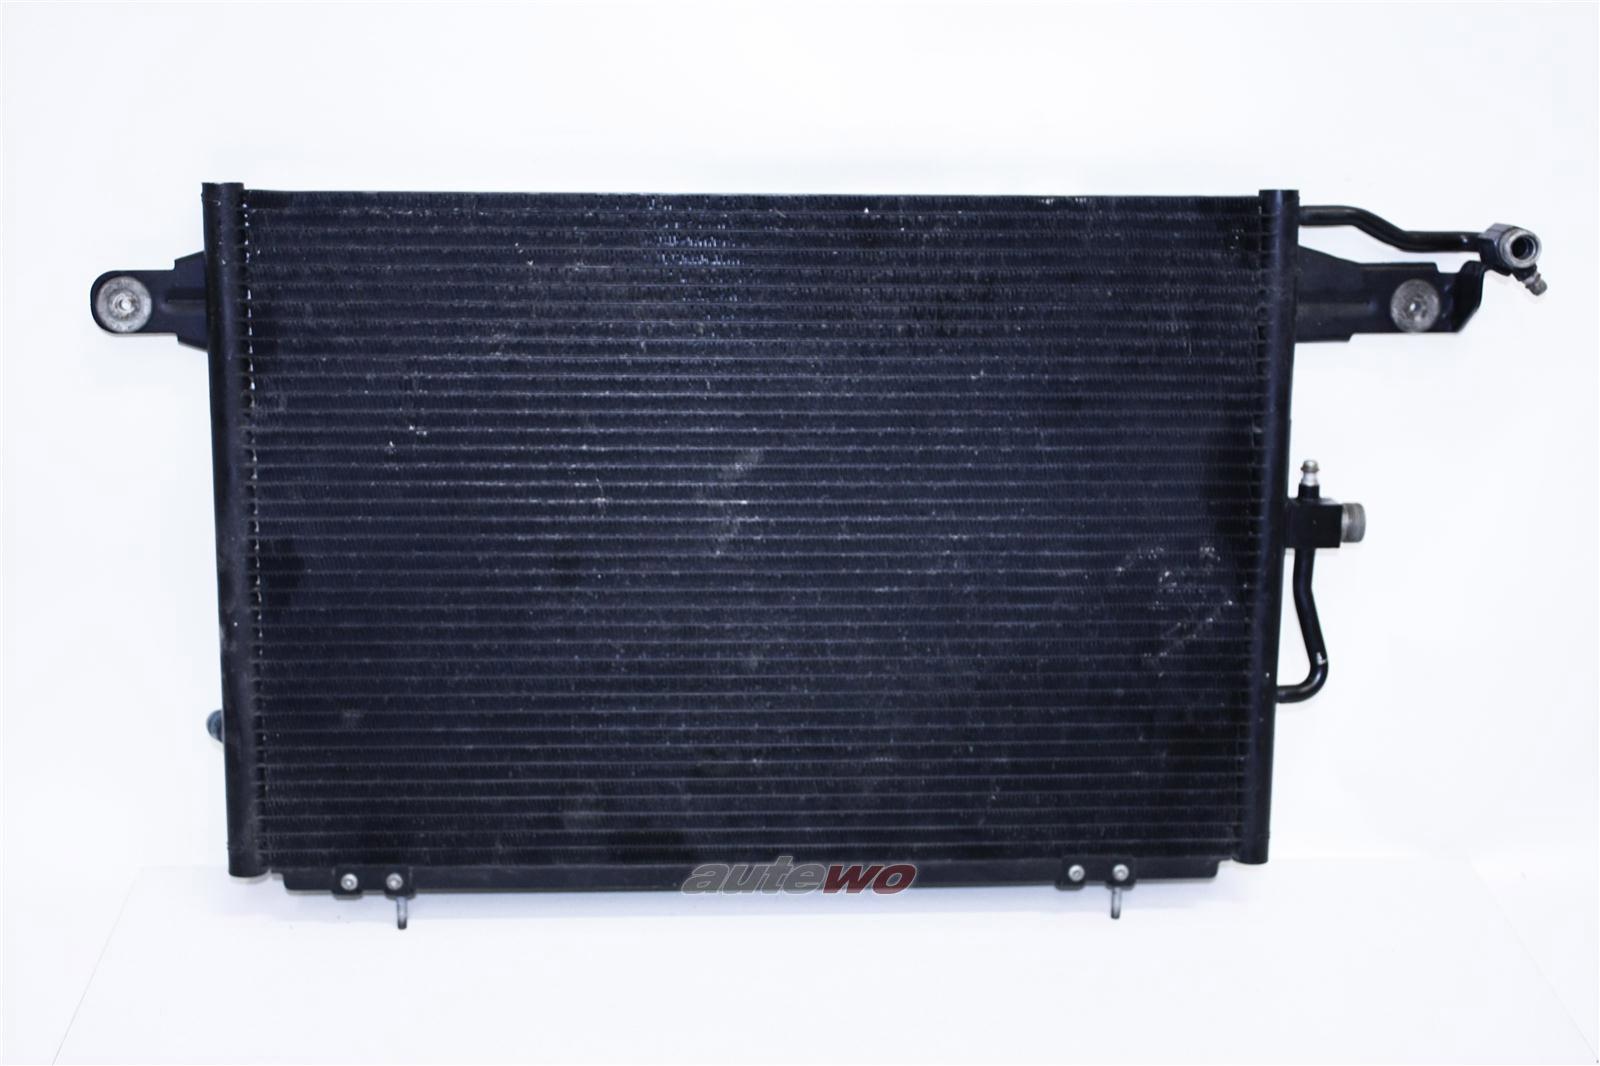 Audi 100/A6/S4/S6 C4 Kältemittel-/Klima-Kondensator R134A 4A0260403AC 4A0260401AB